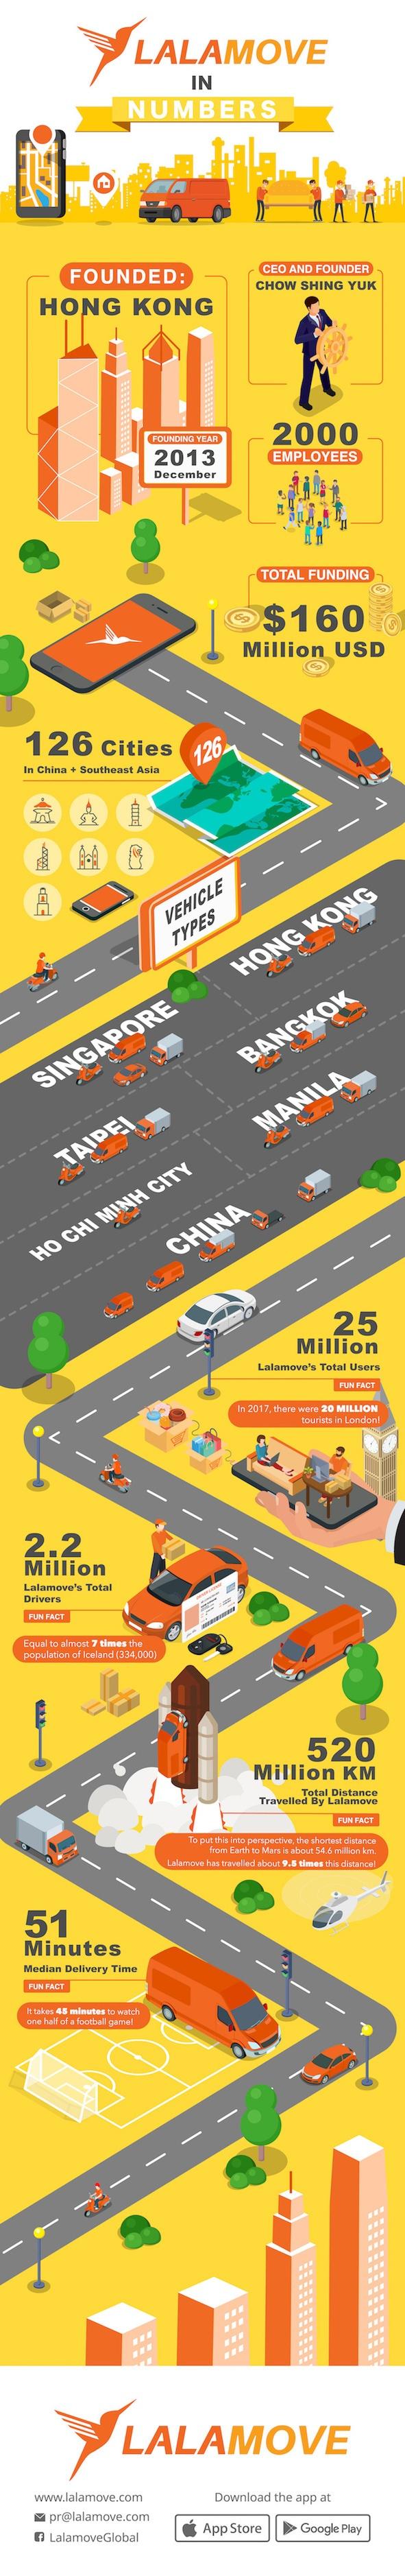 Lalamove Infographic April 2018